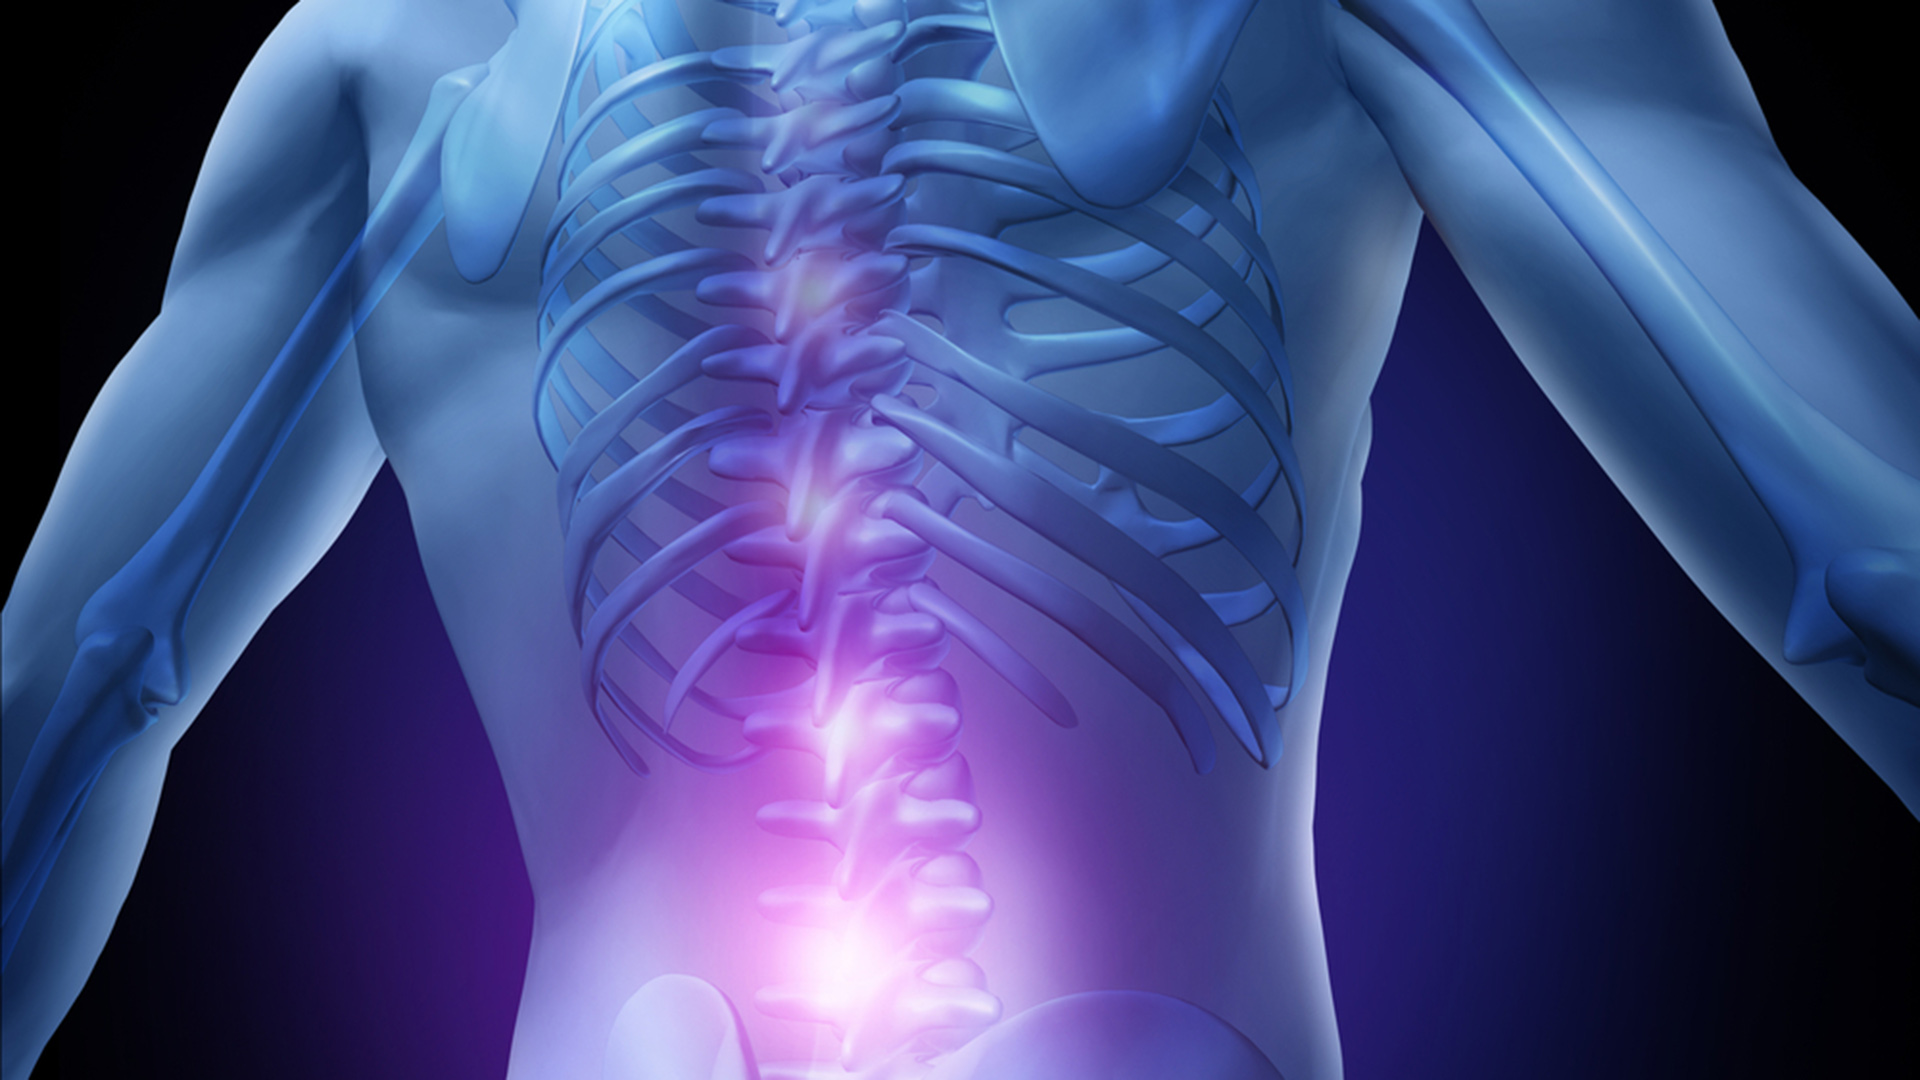 generice de tratament articular artroza și artrita tratament eficient